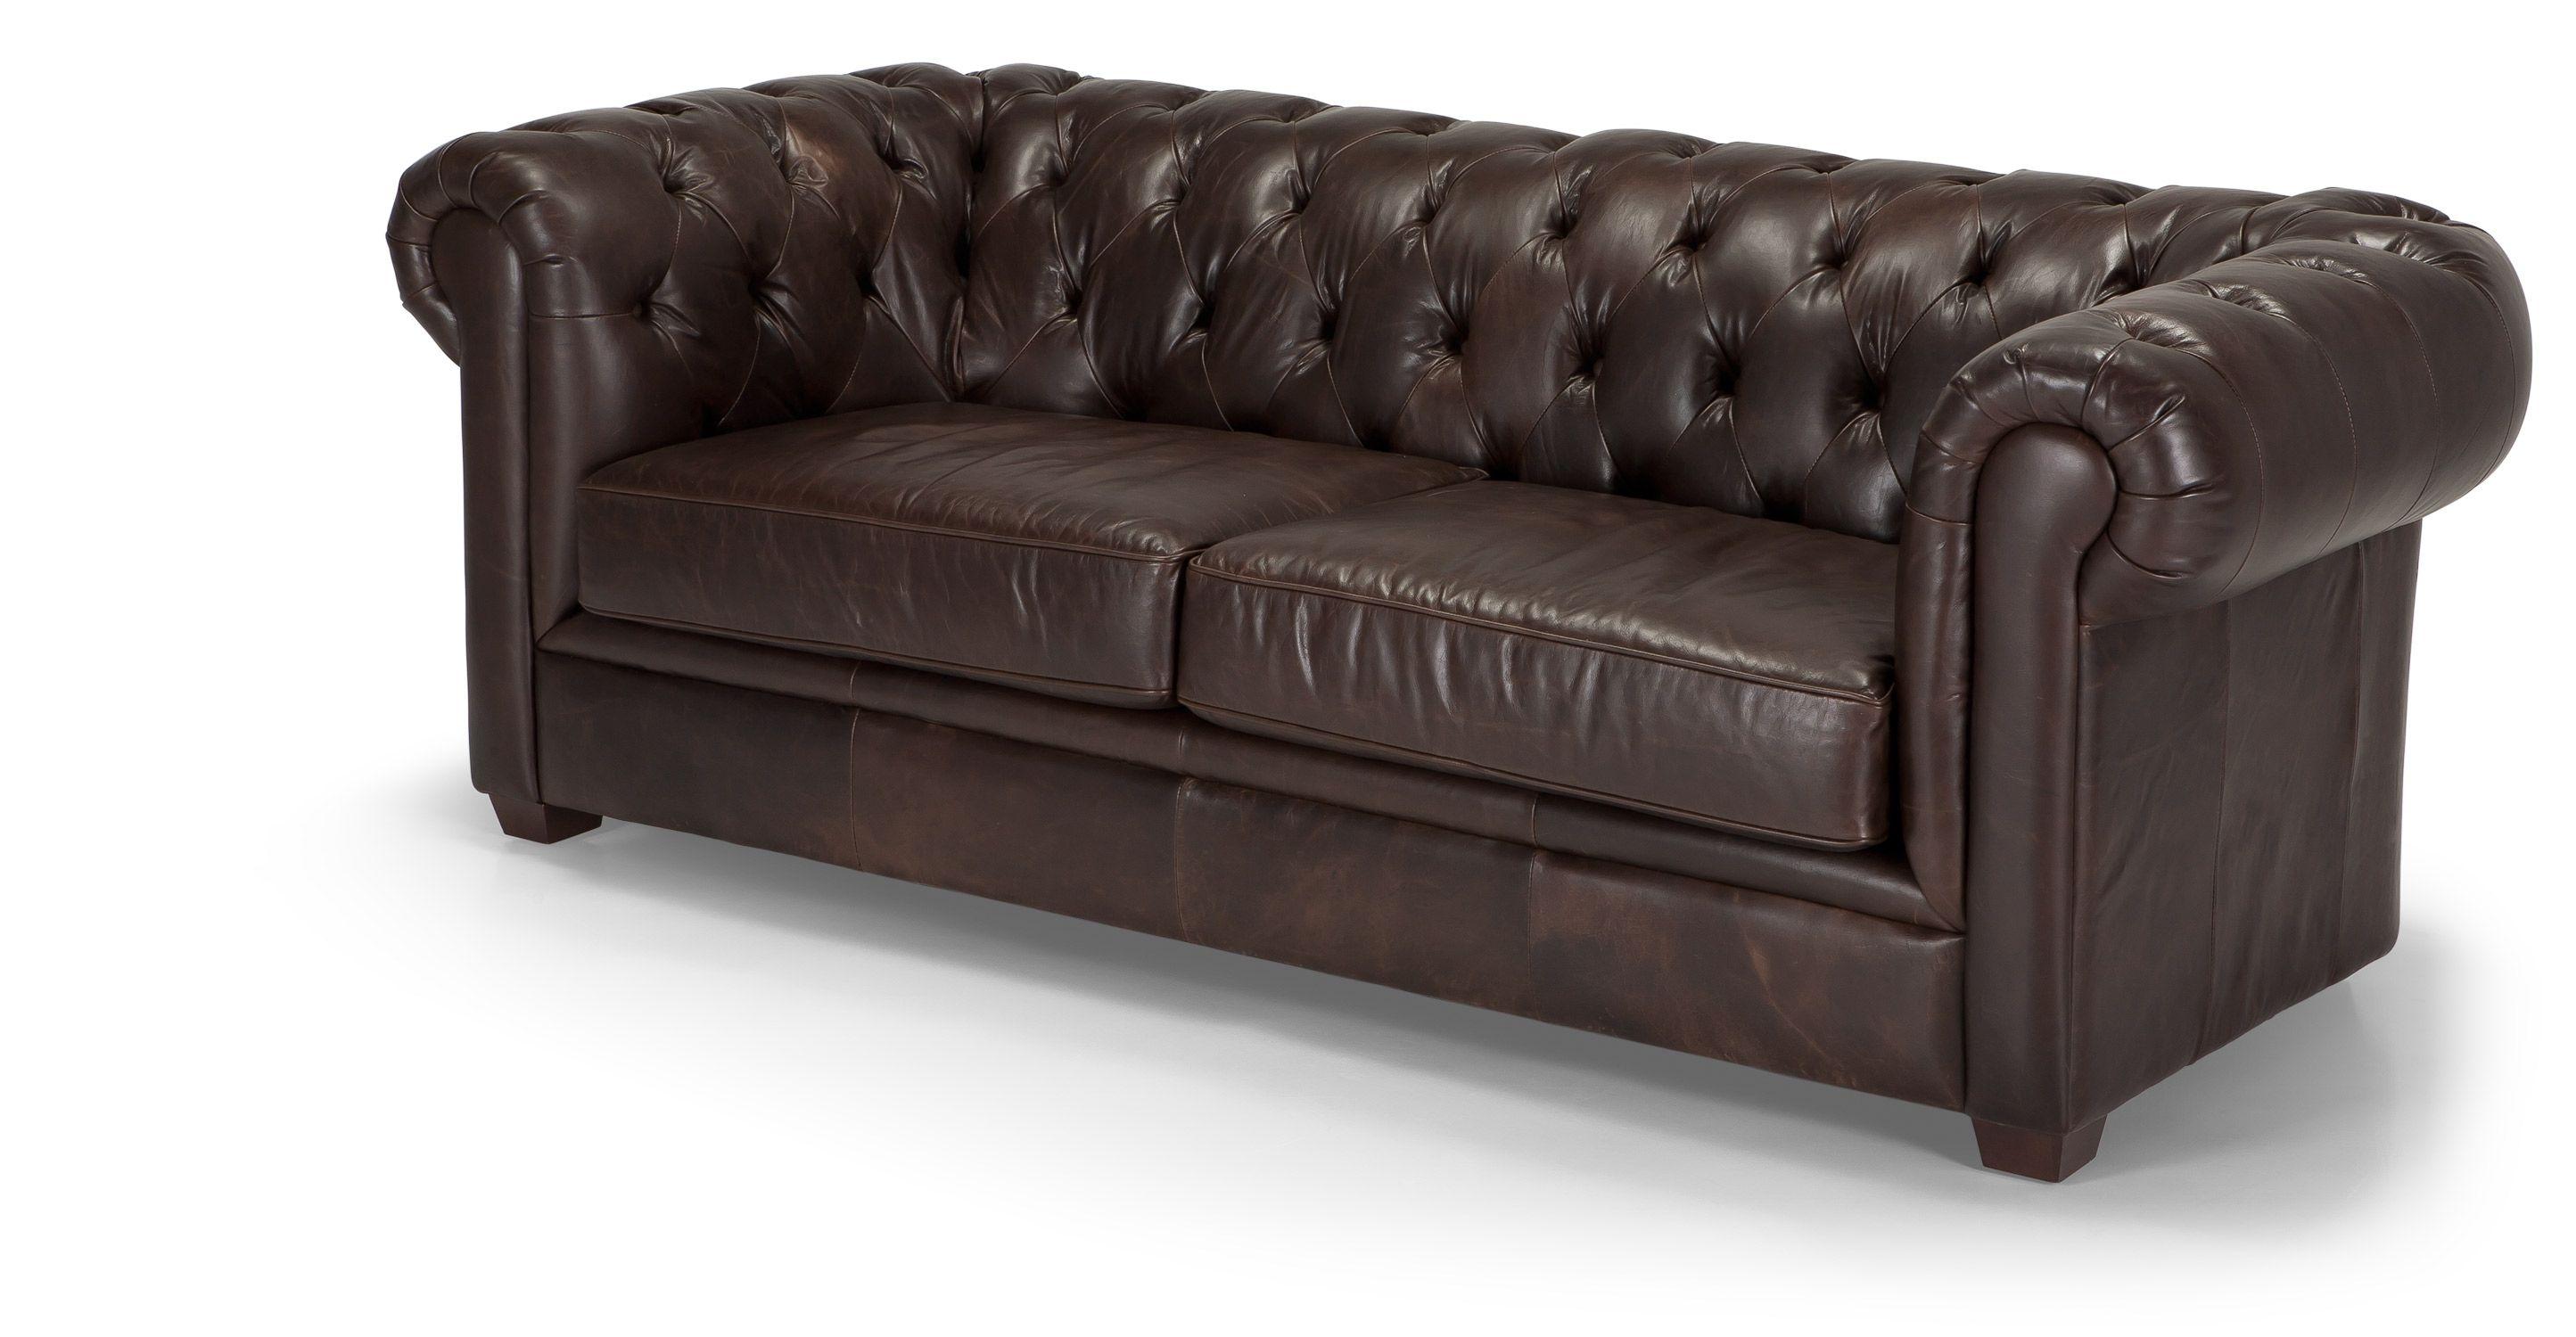 retro sofas fulham sofa sleeper with memory foam mattress mayson chesterfield 3 seater antique brown premium